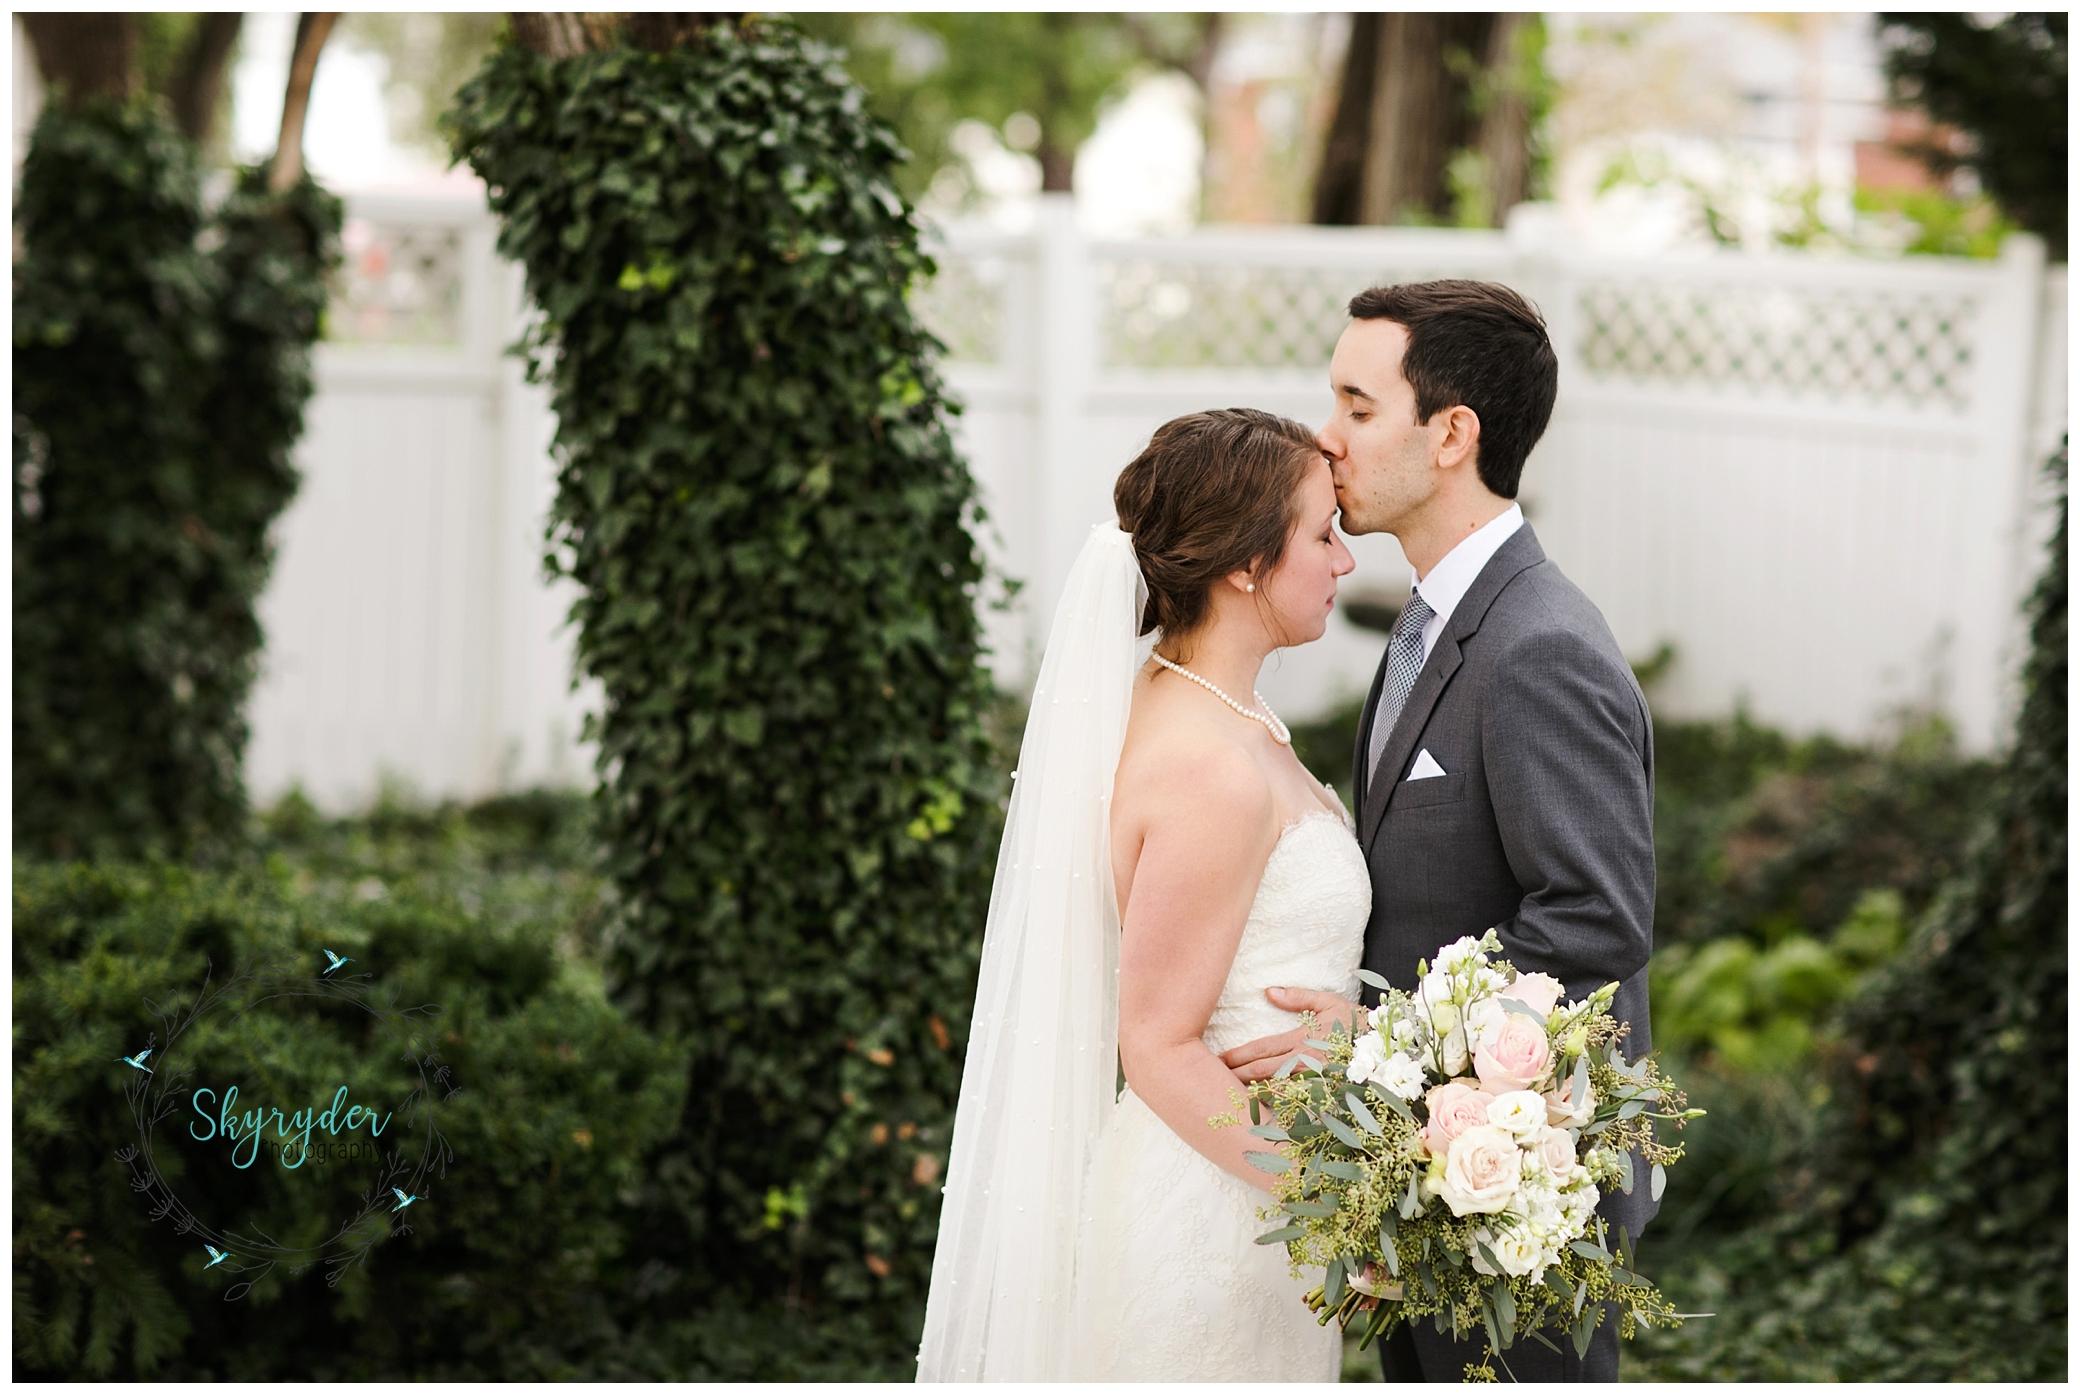 jennifer + eric | the maridor | roanoke wedding photographer